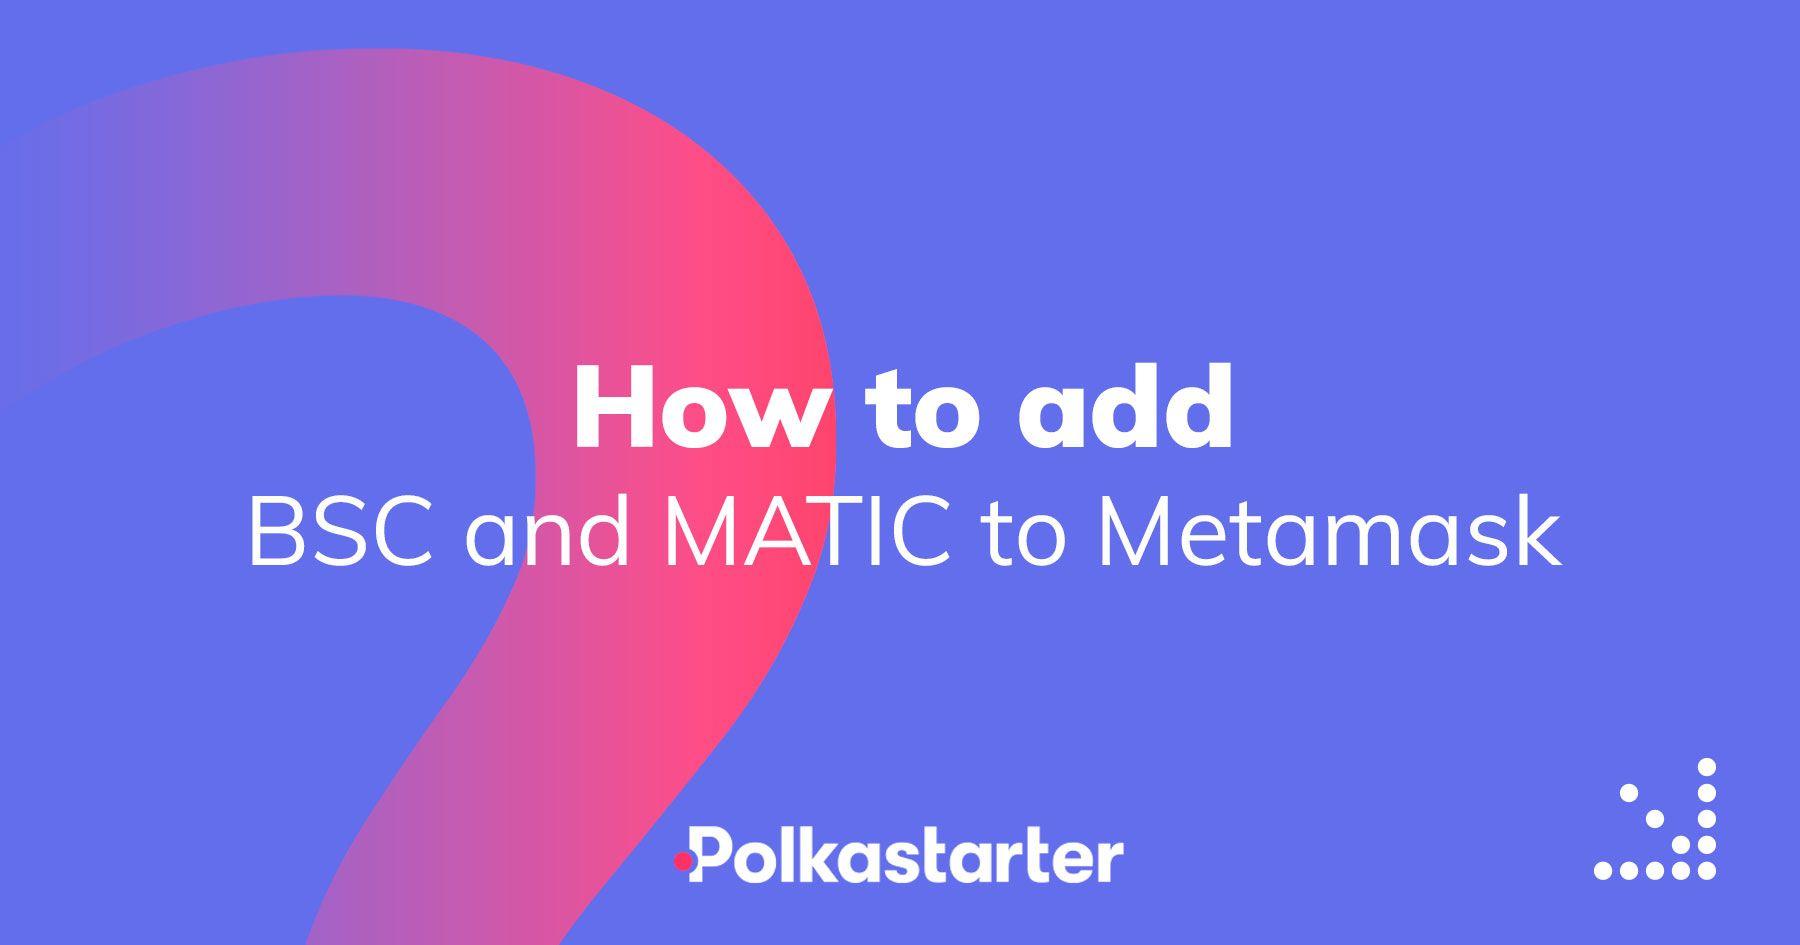 [PolkaStarter] How to add Binance Smart Chain and Polygon (MATIC) to MetaMask - AZCoin News